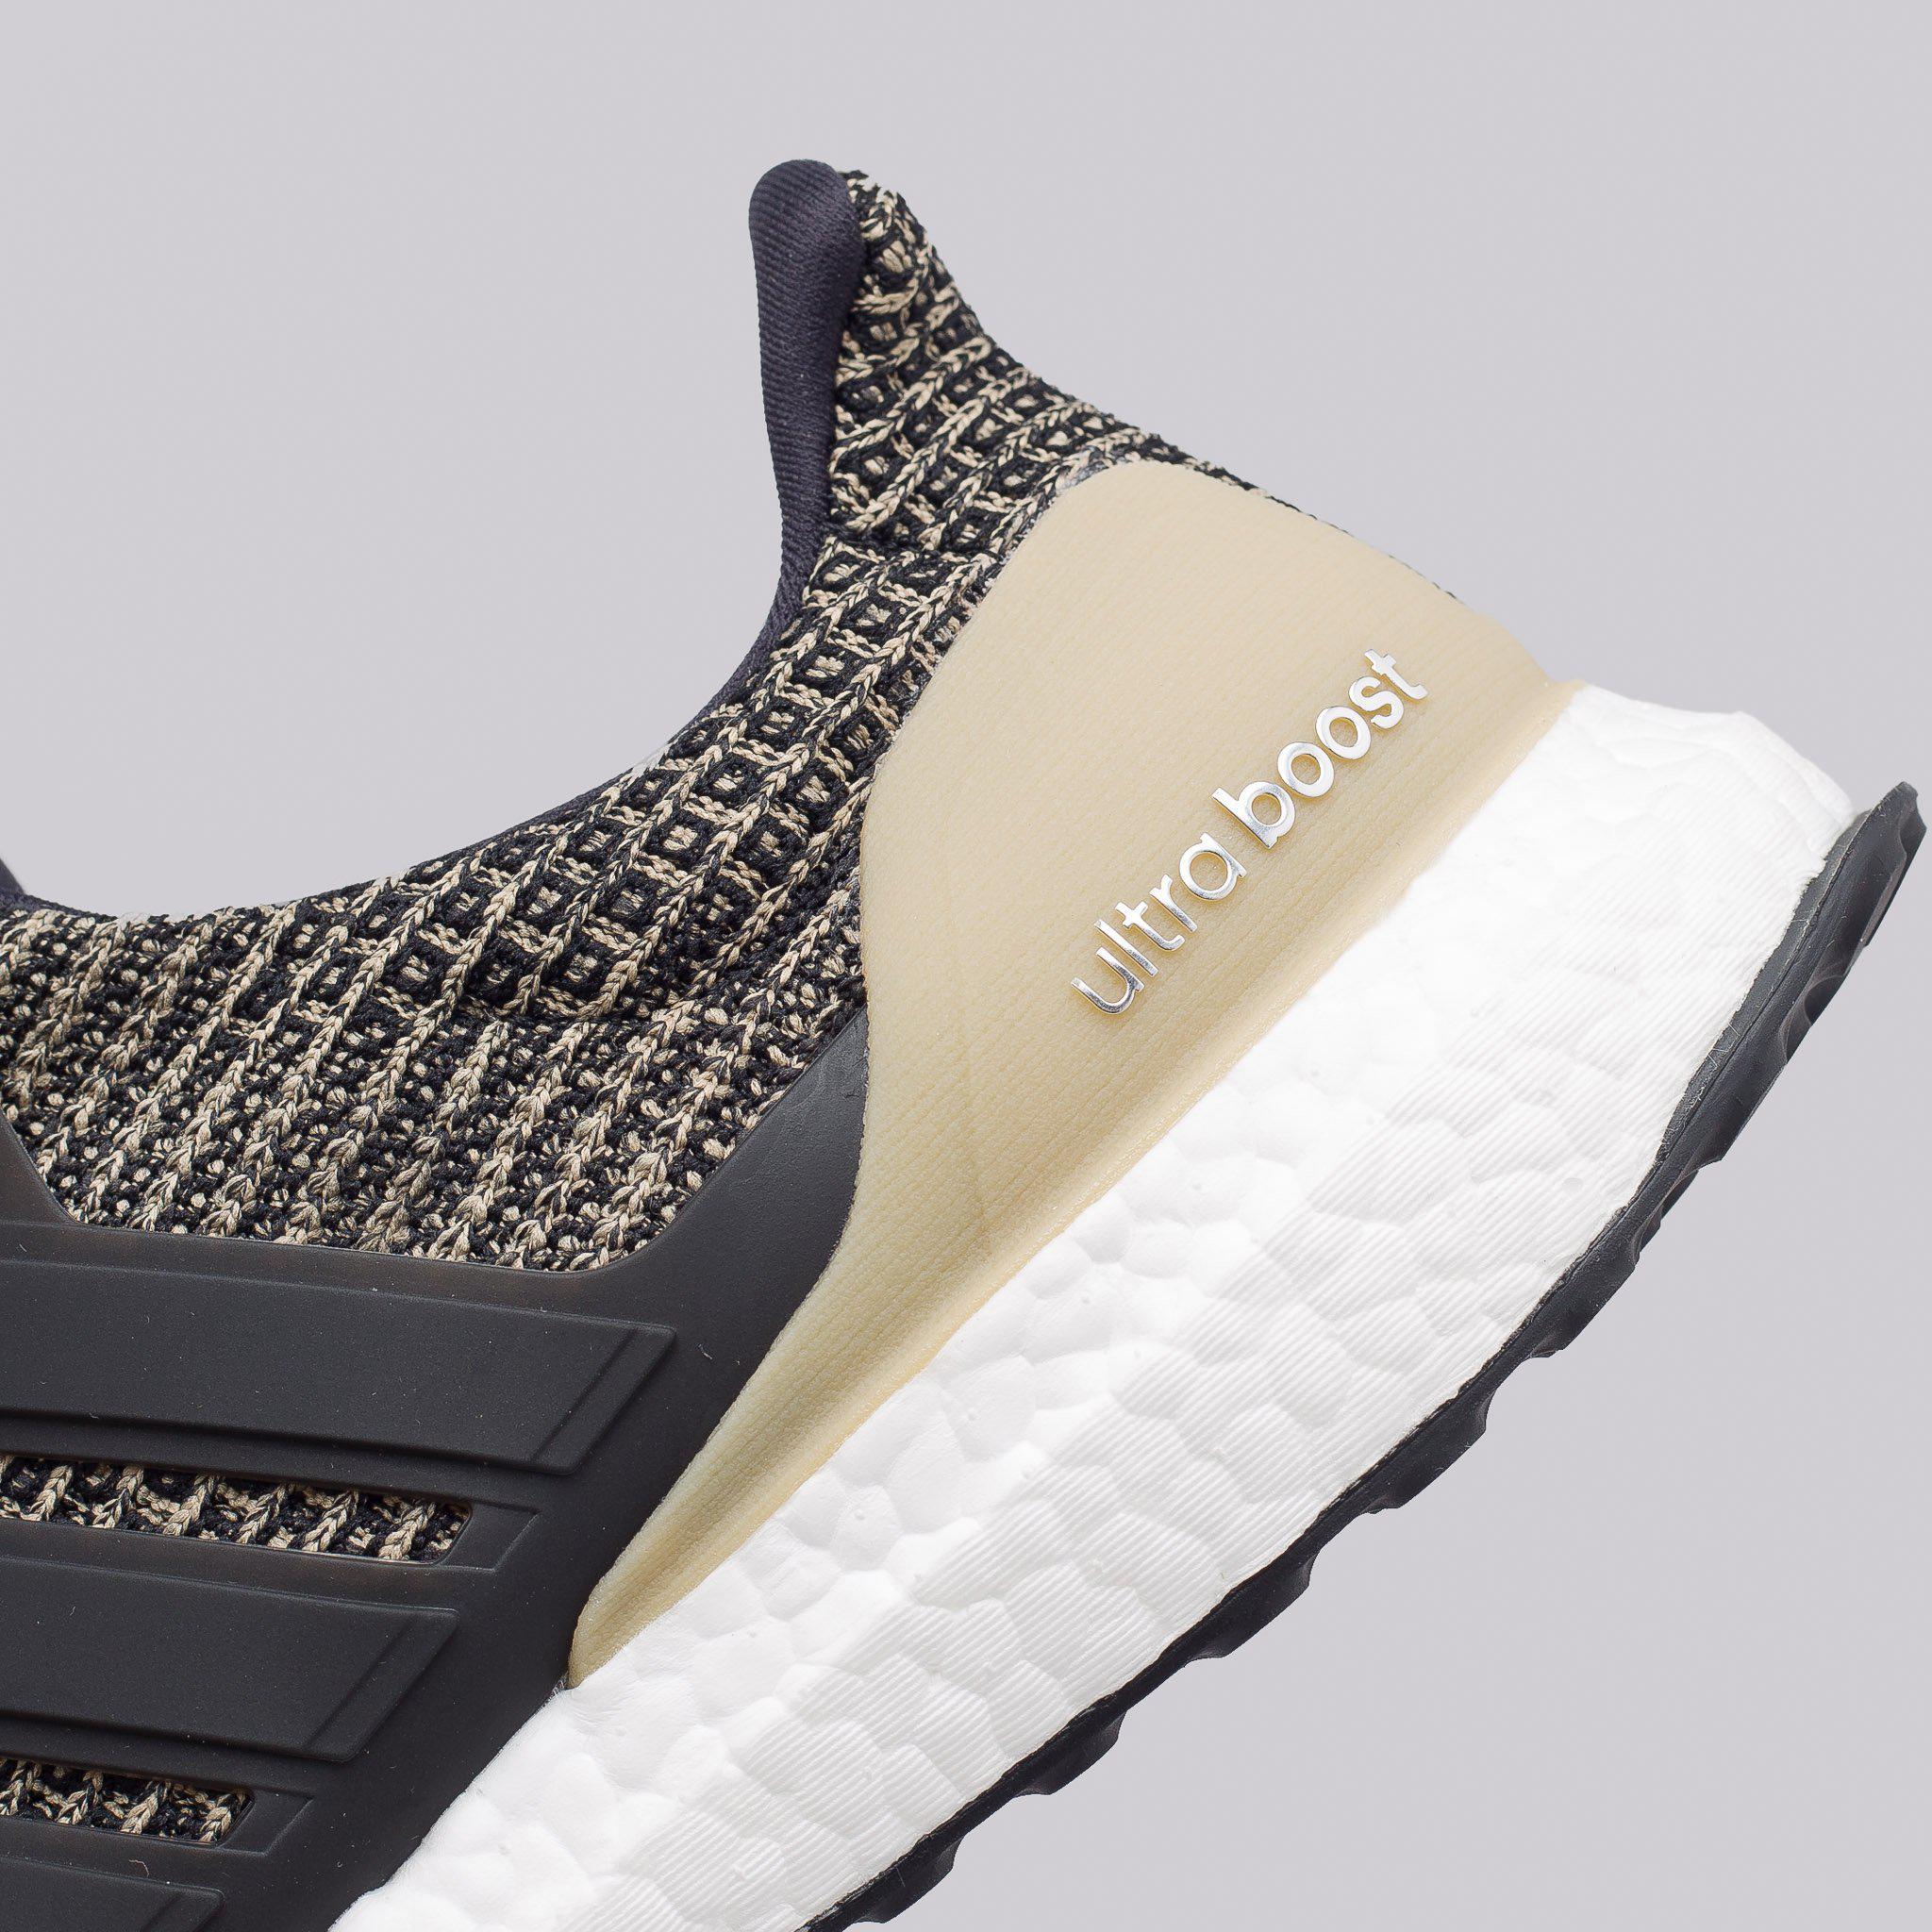 bd40652af55 Lyst - adidas Ultraboost 4.0 In Core Black dark Mocha in Black for Men